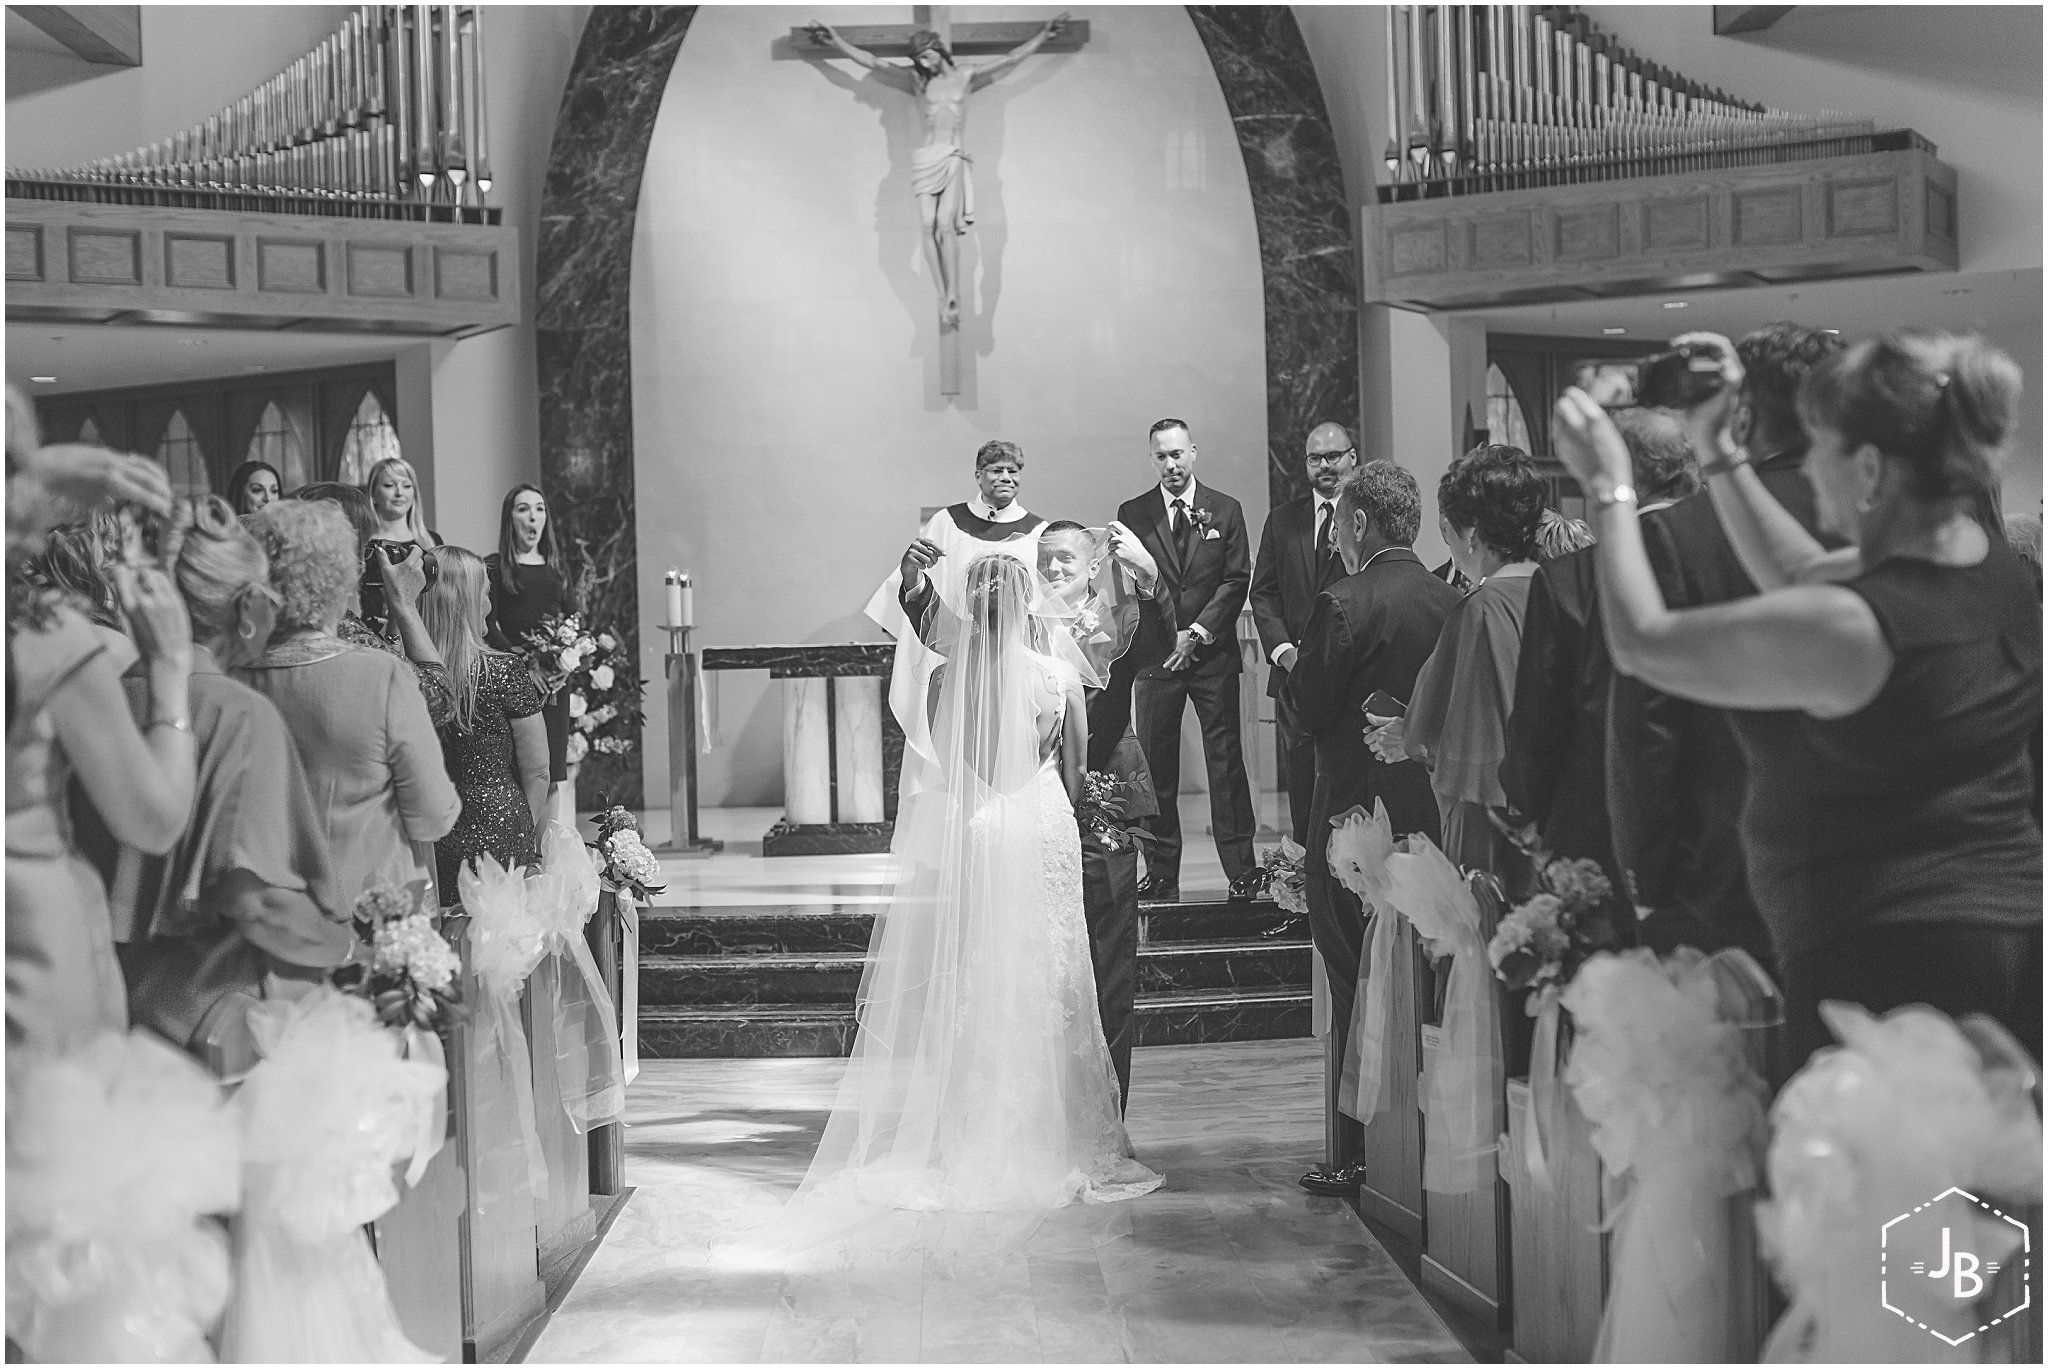 WeddingandEngagementFloridaPhotographer_0202.jpg